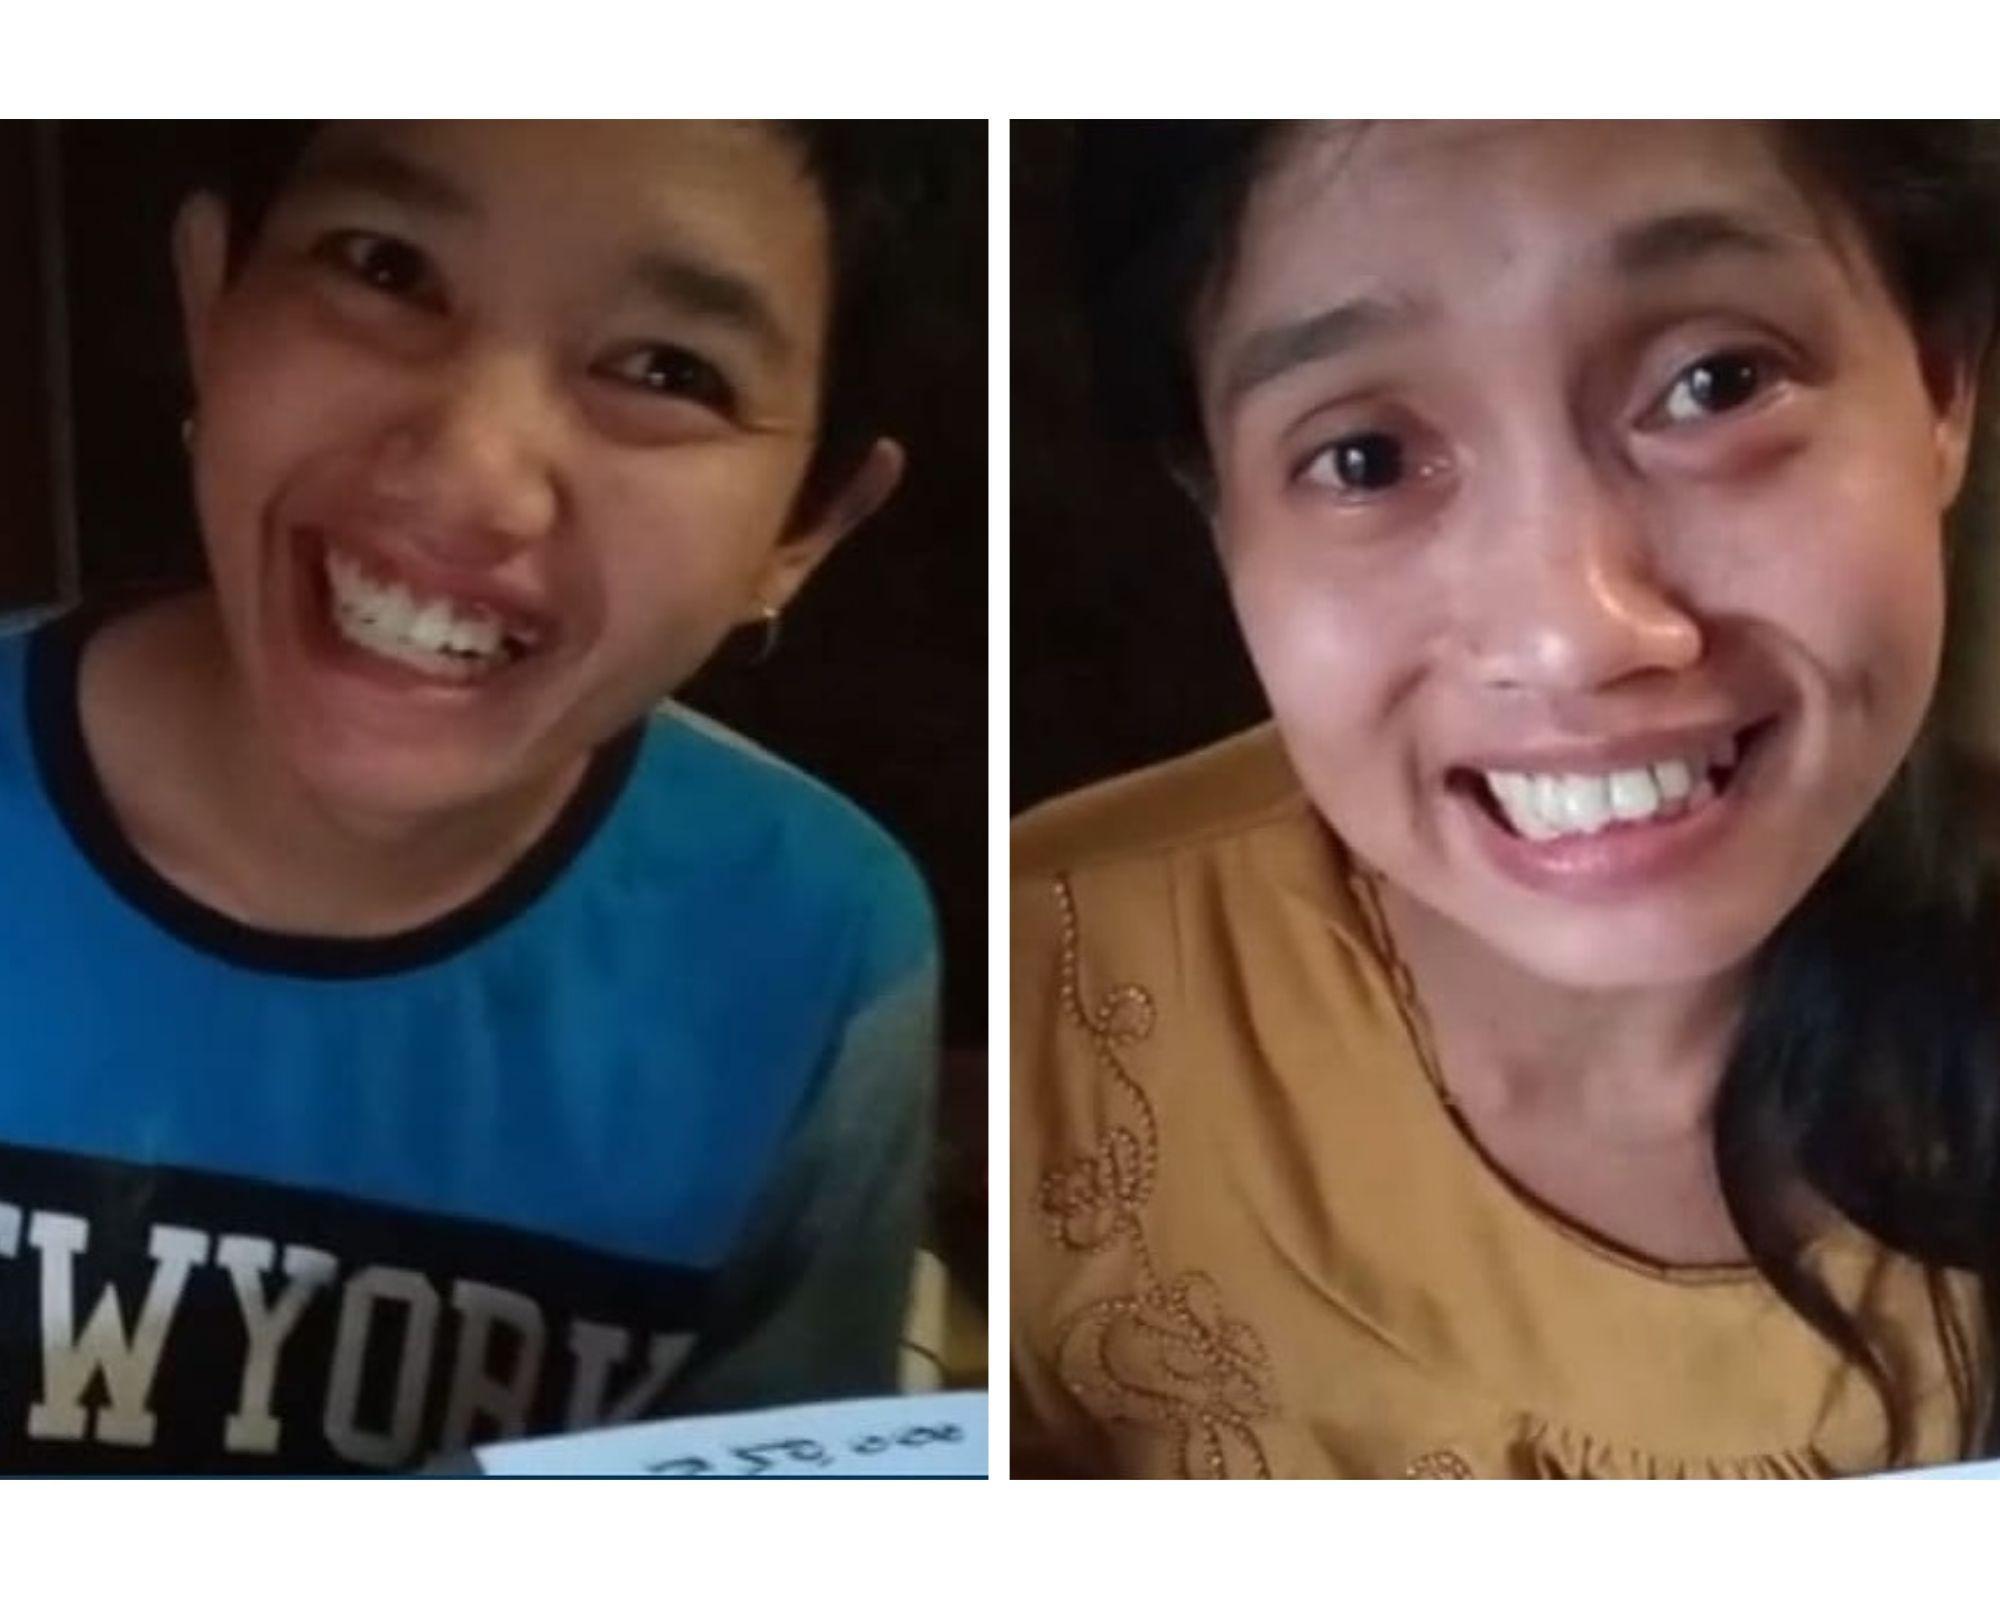 Kakak beradik di Malang yang dikabarkan terkena stroke usai melahirkan. (Foto: Instagram/vivipdharapan)